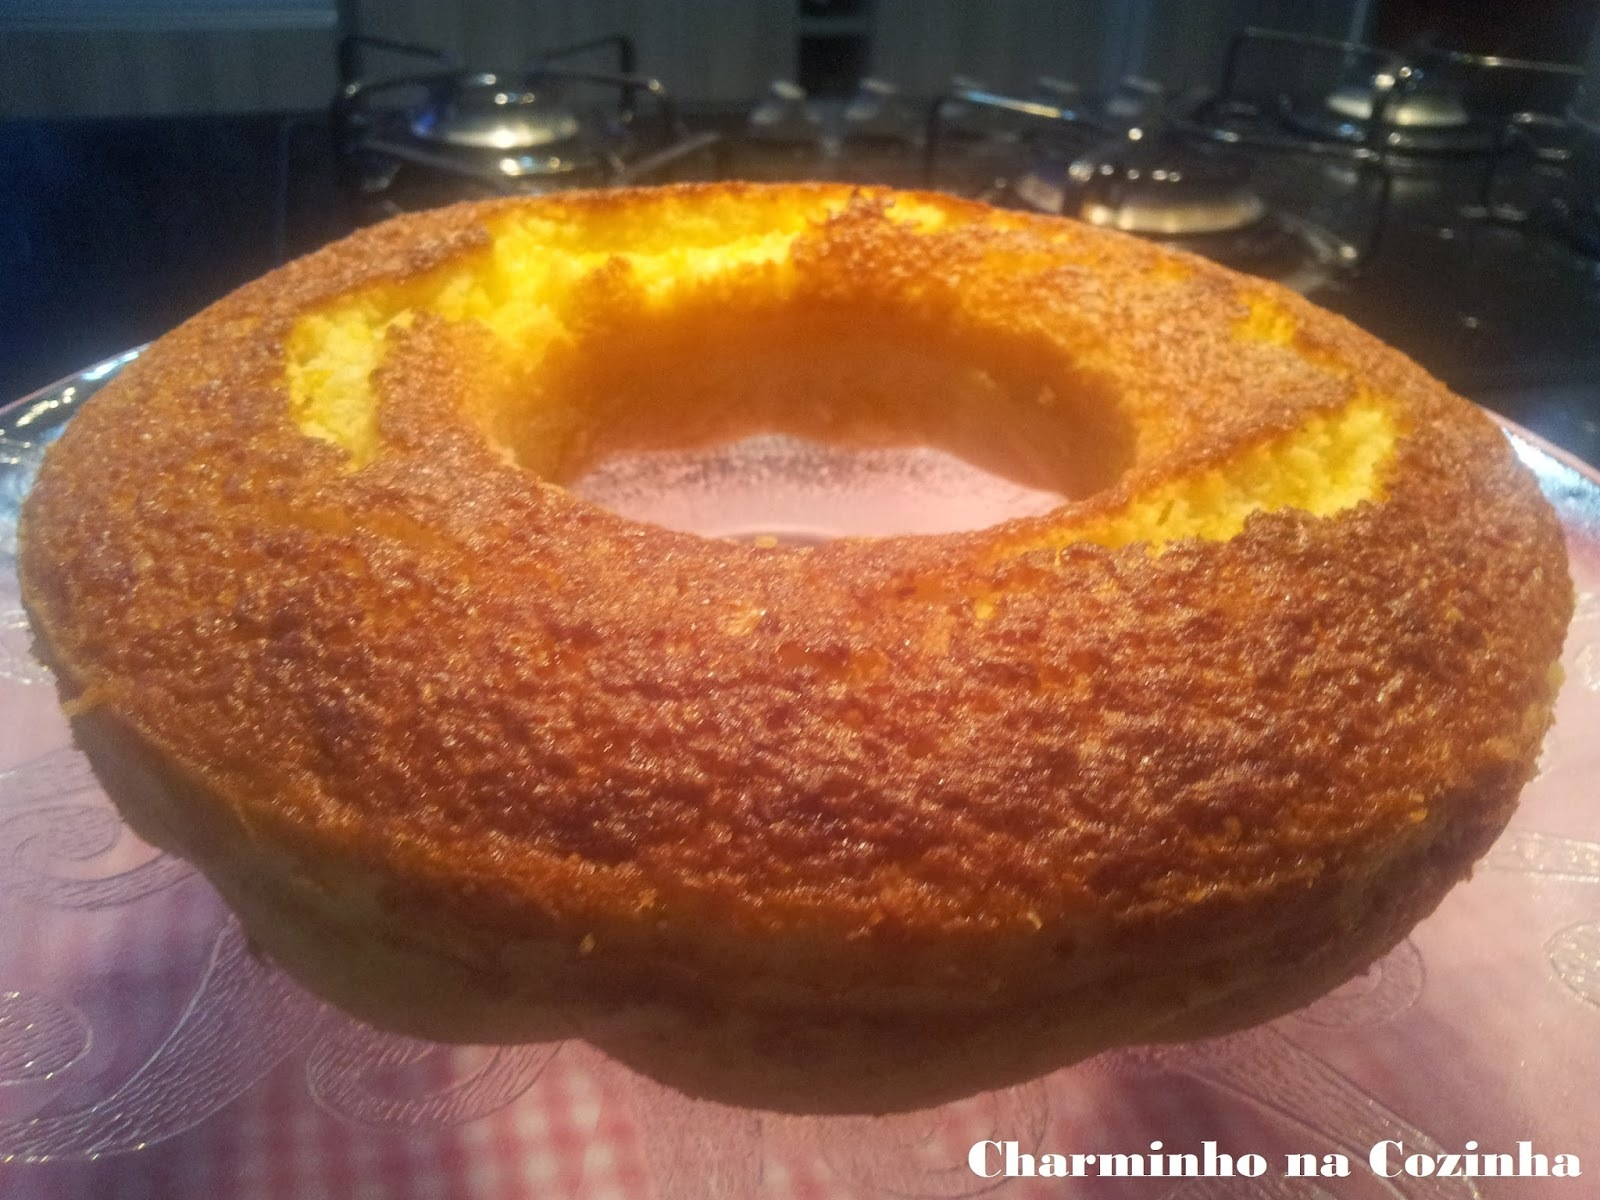 bolo de milharina com coco no liquidificador